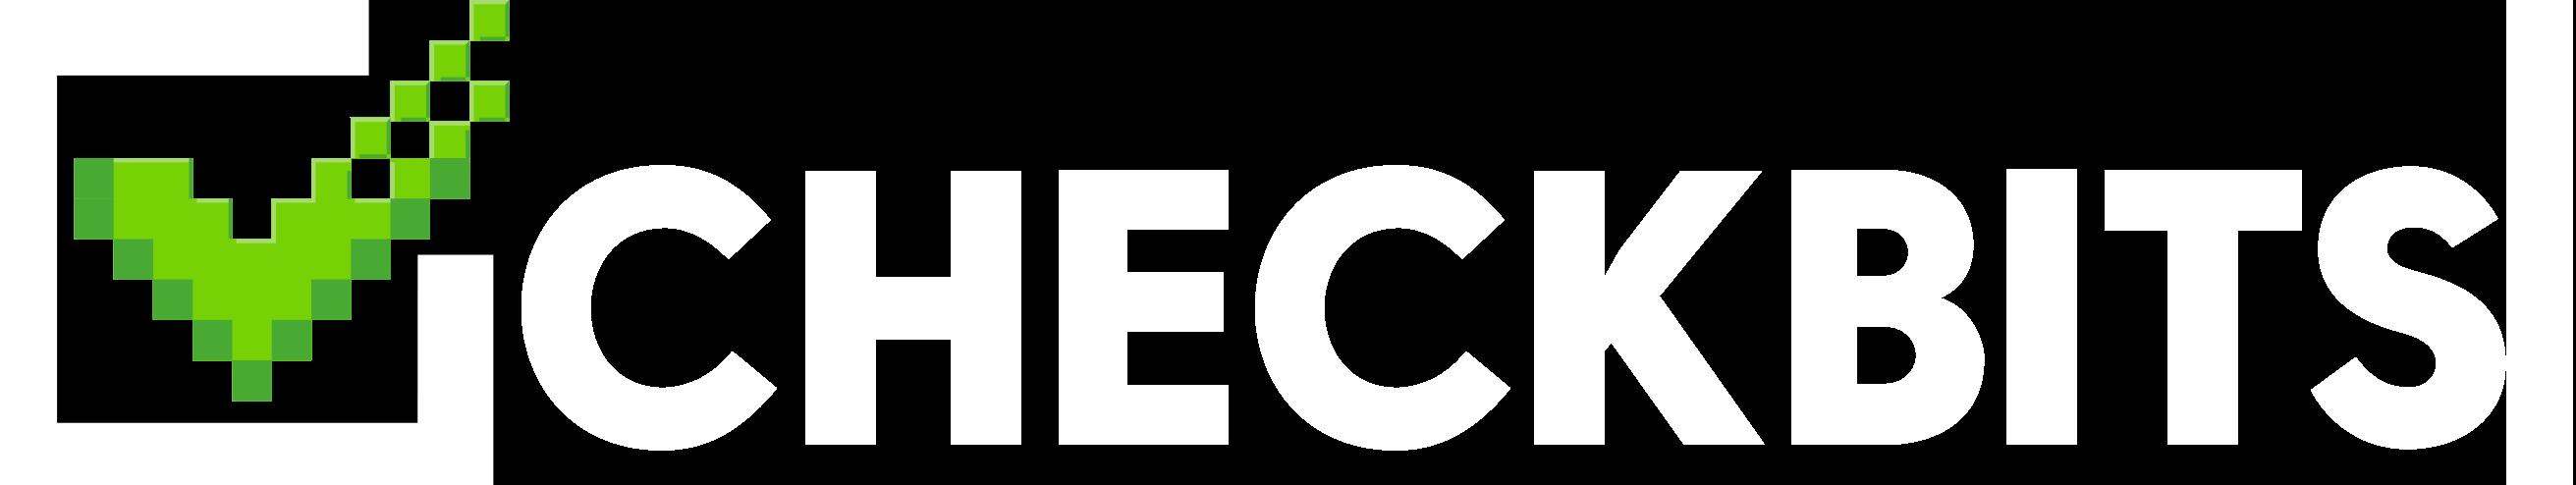 checkbits logo